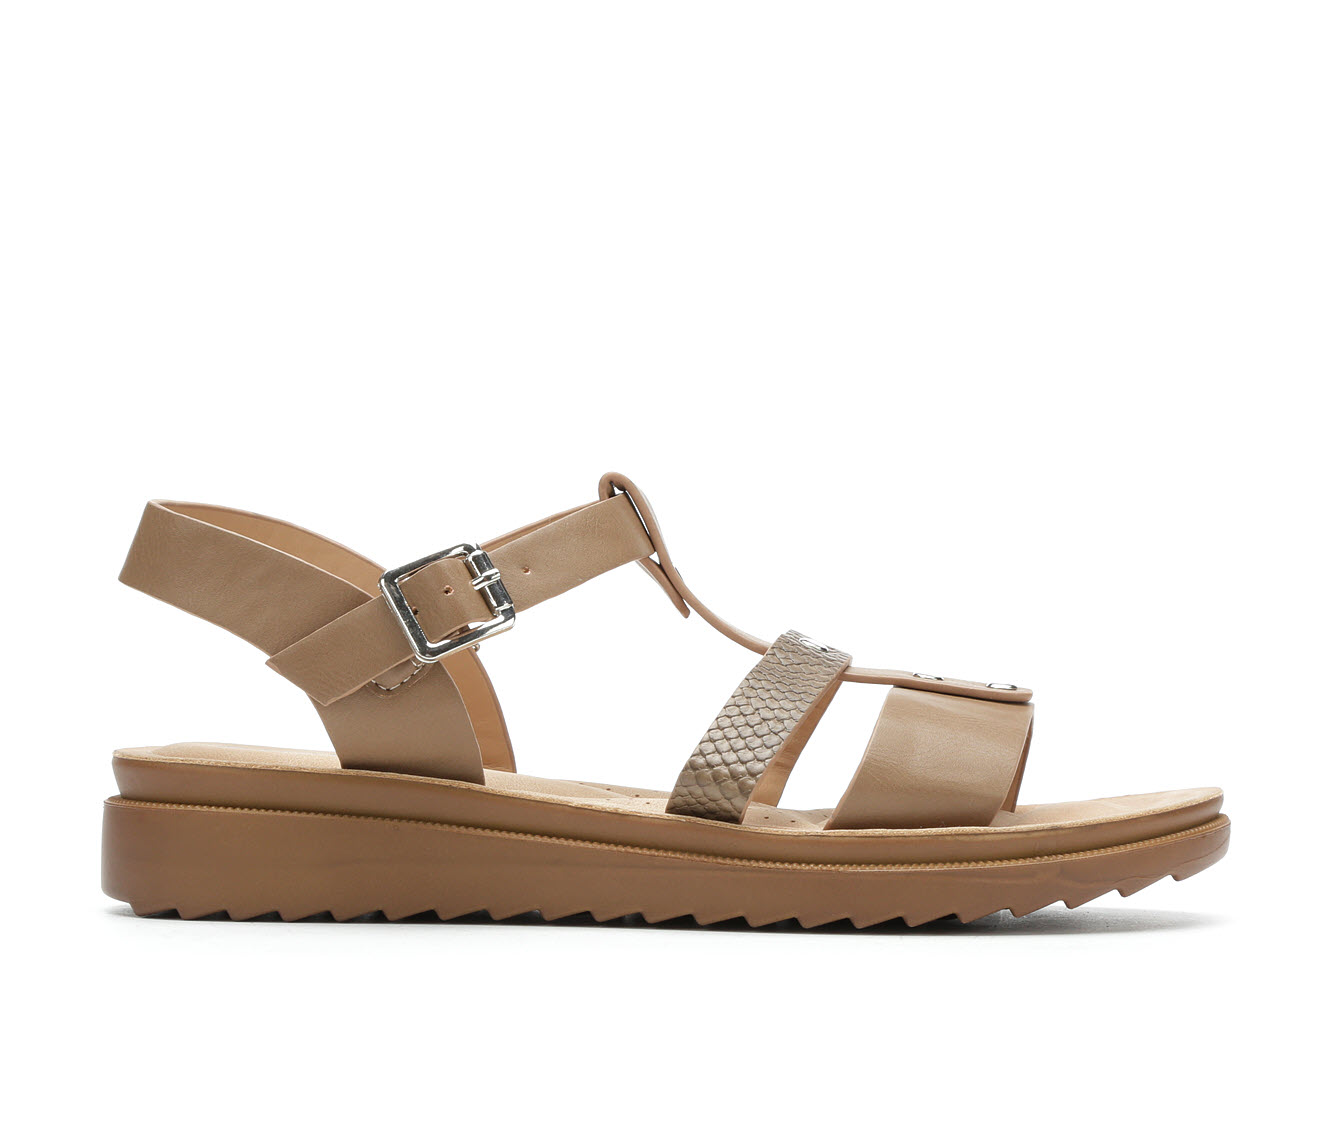 Andiamo Oilly Women's Sandal (Beige Faux Leather)